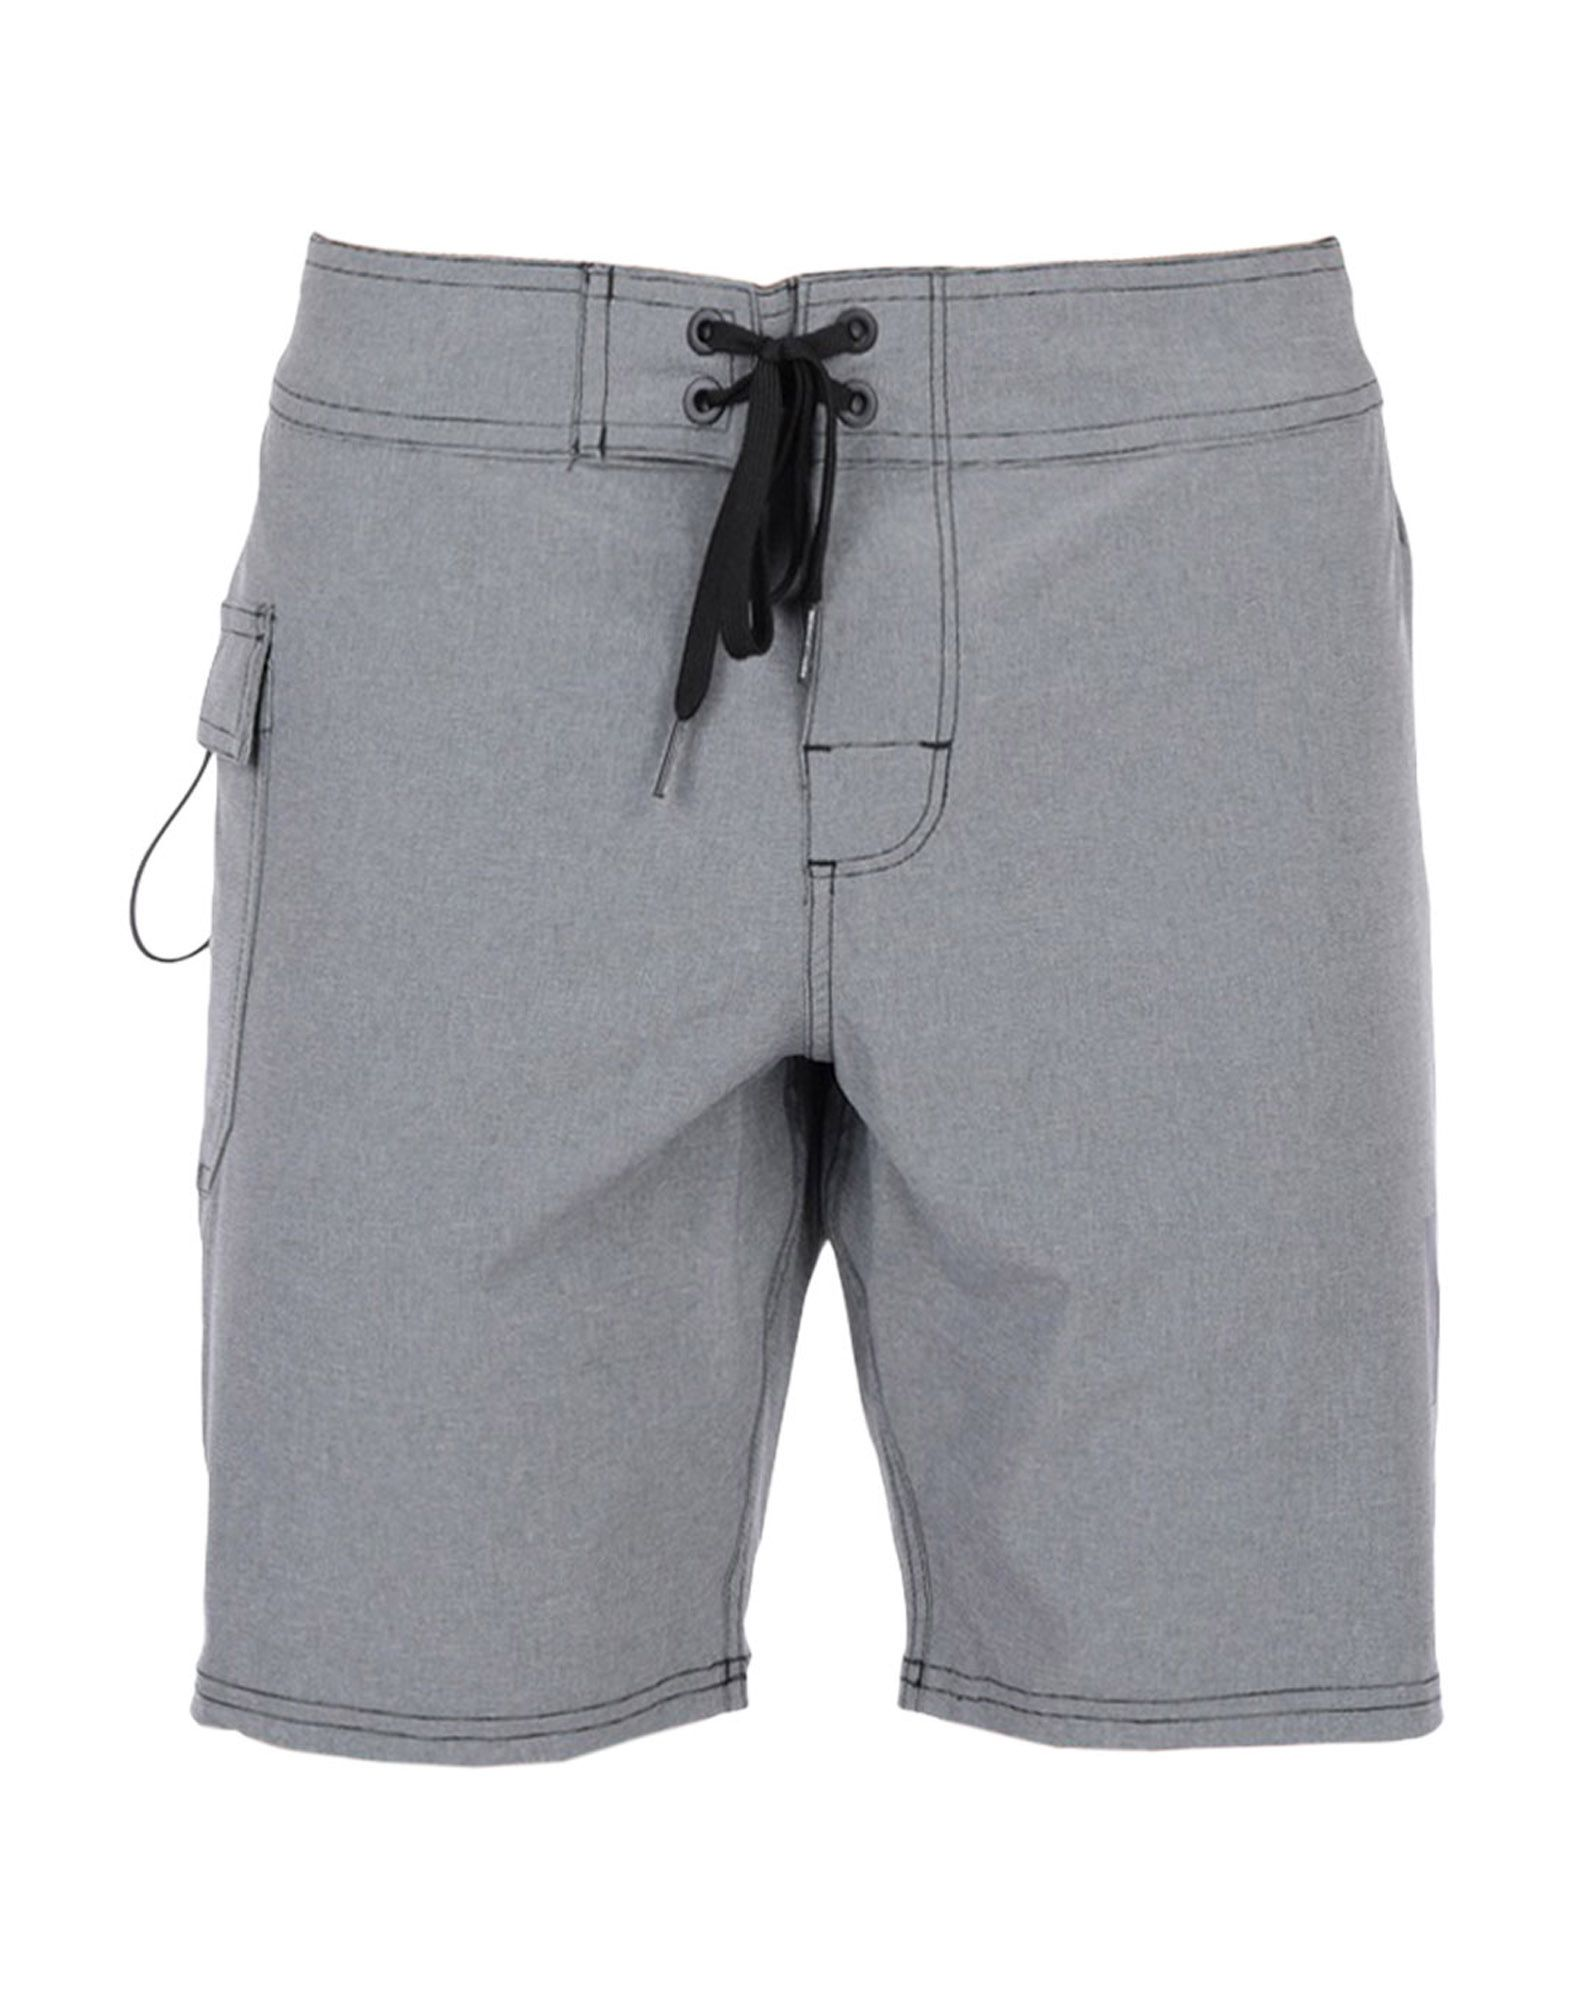 DC SHOECOUSA Пляжные брюки и шорты шорты классические dc rushbury 19 periscope